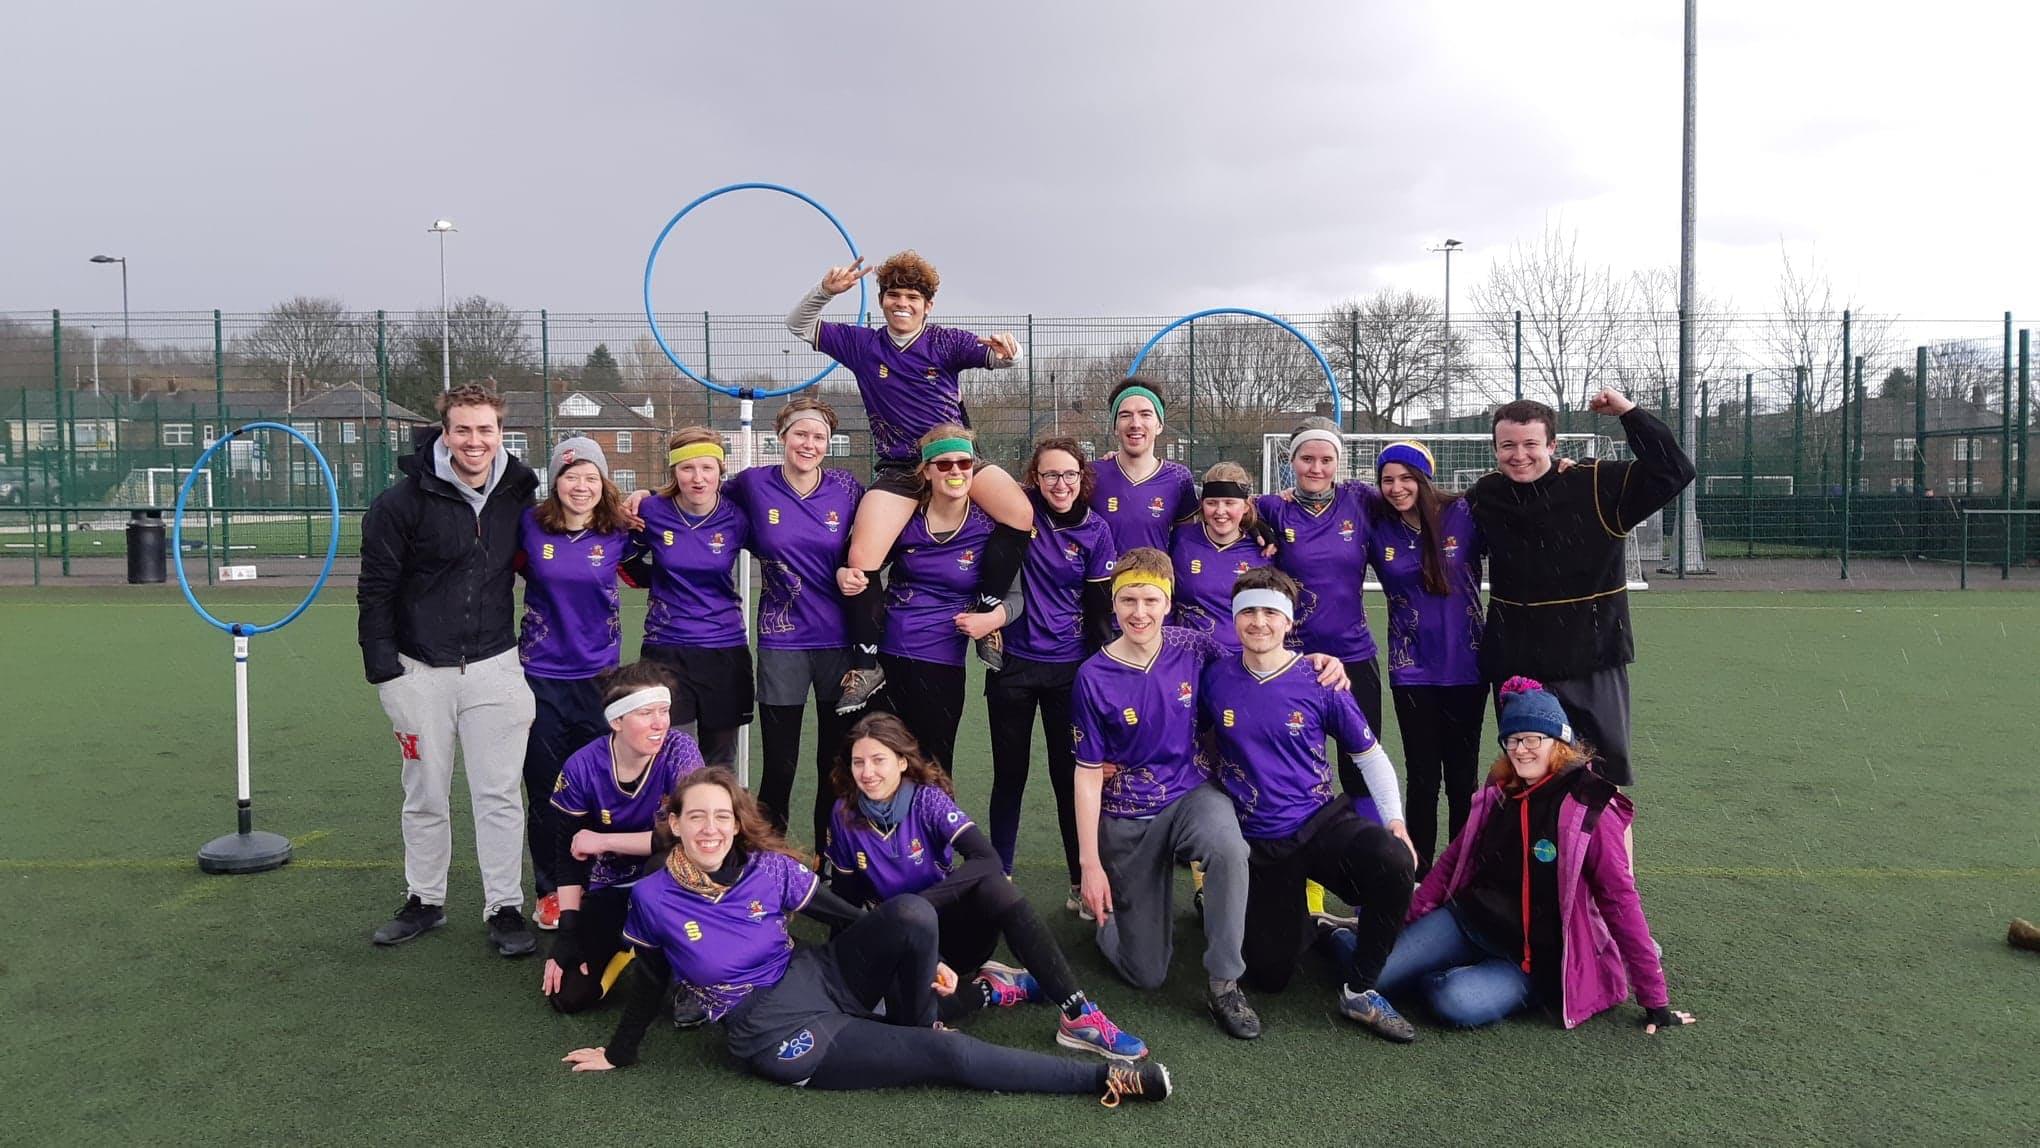 Manchester Universities Quidditch Club